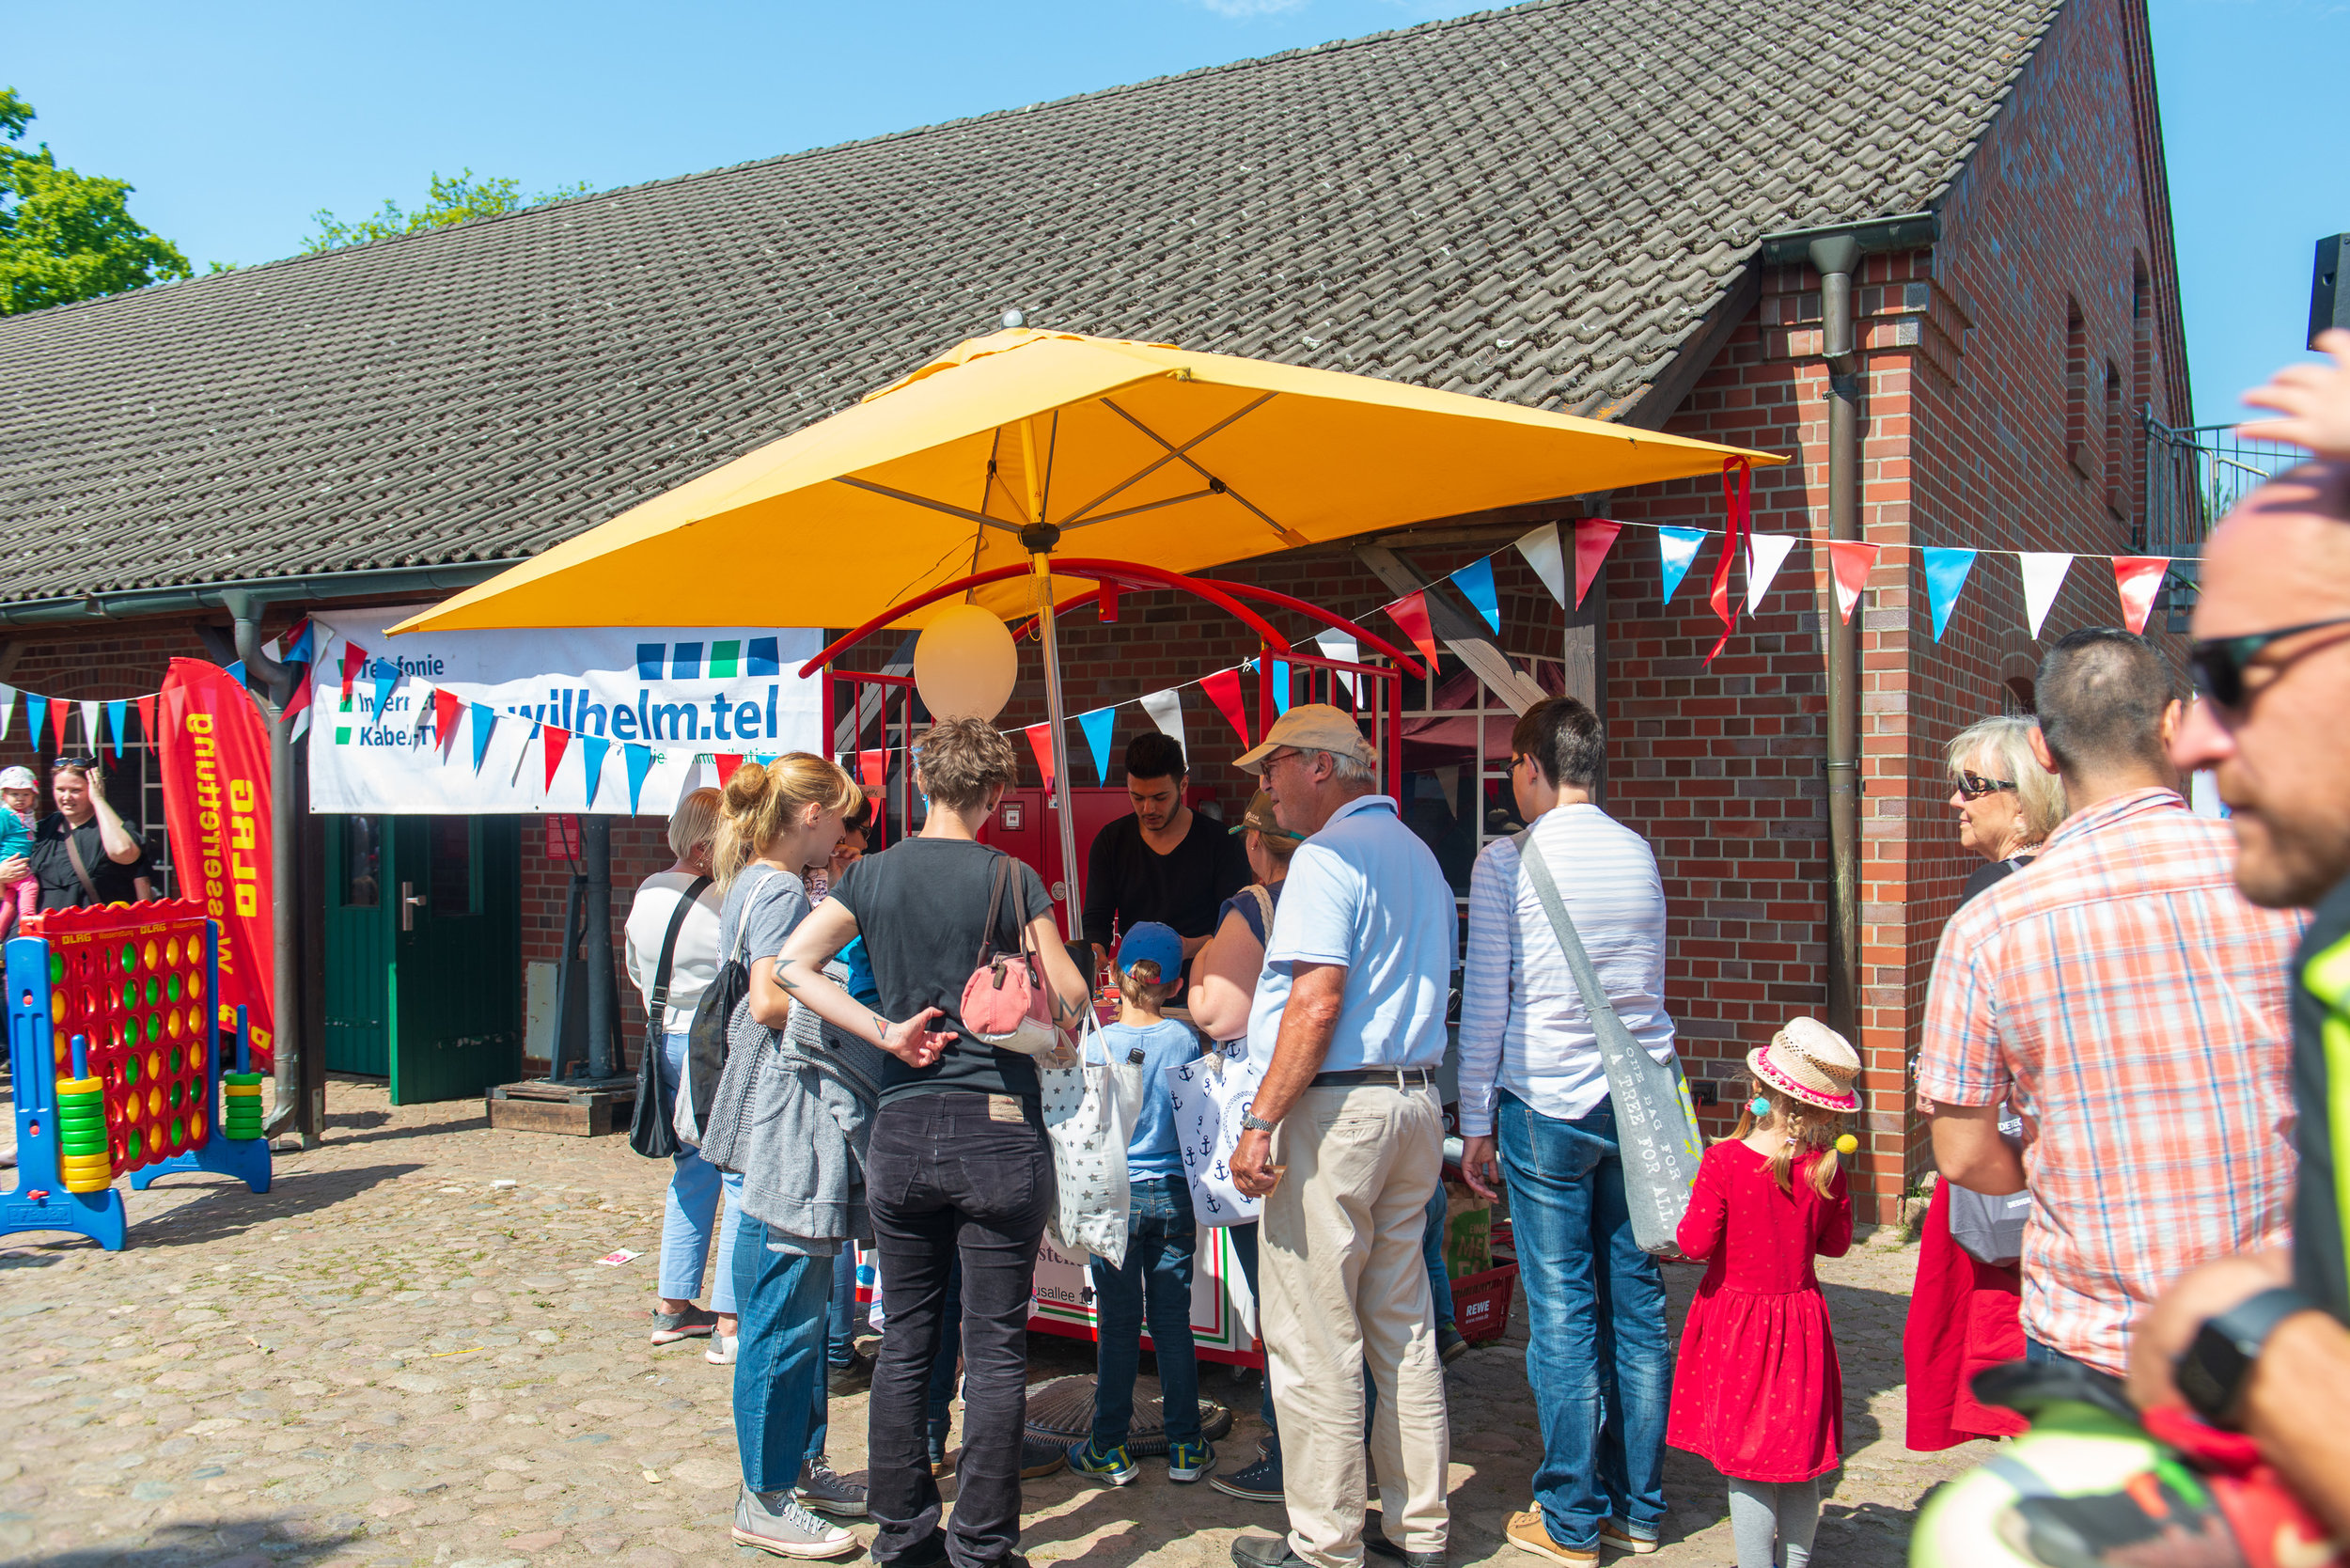 13-Norderstedter-Museumsfest-2019-FWM--XO-Dennys-Mamero-WEB-19.jpg